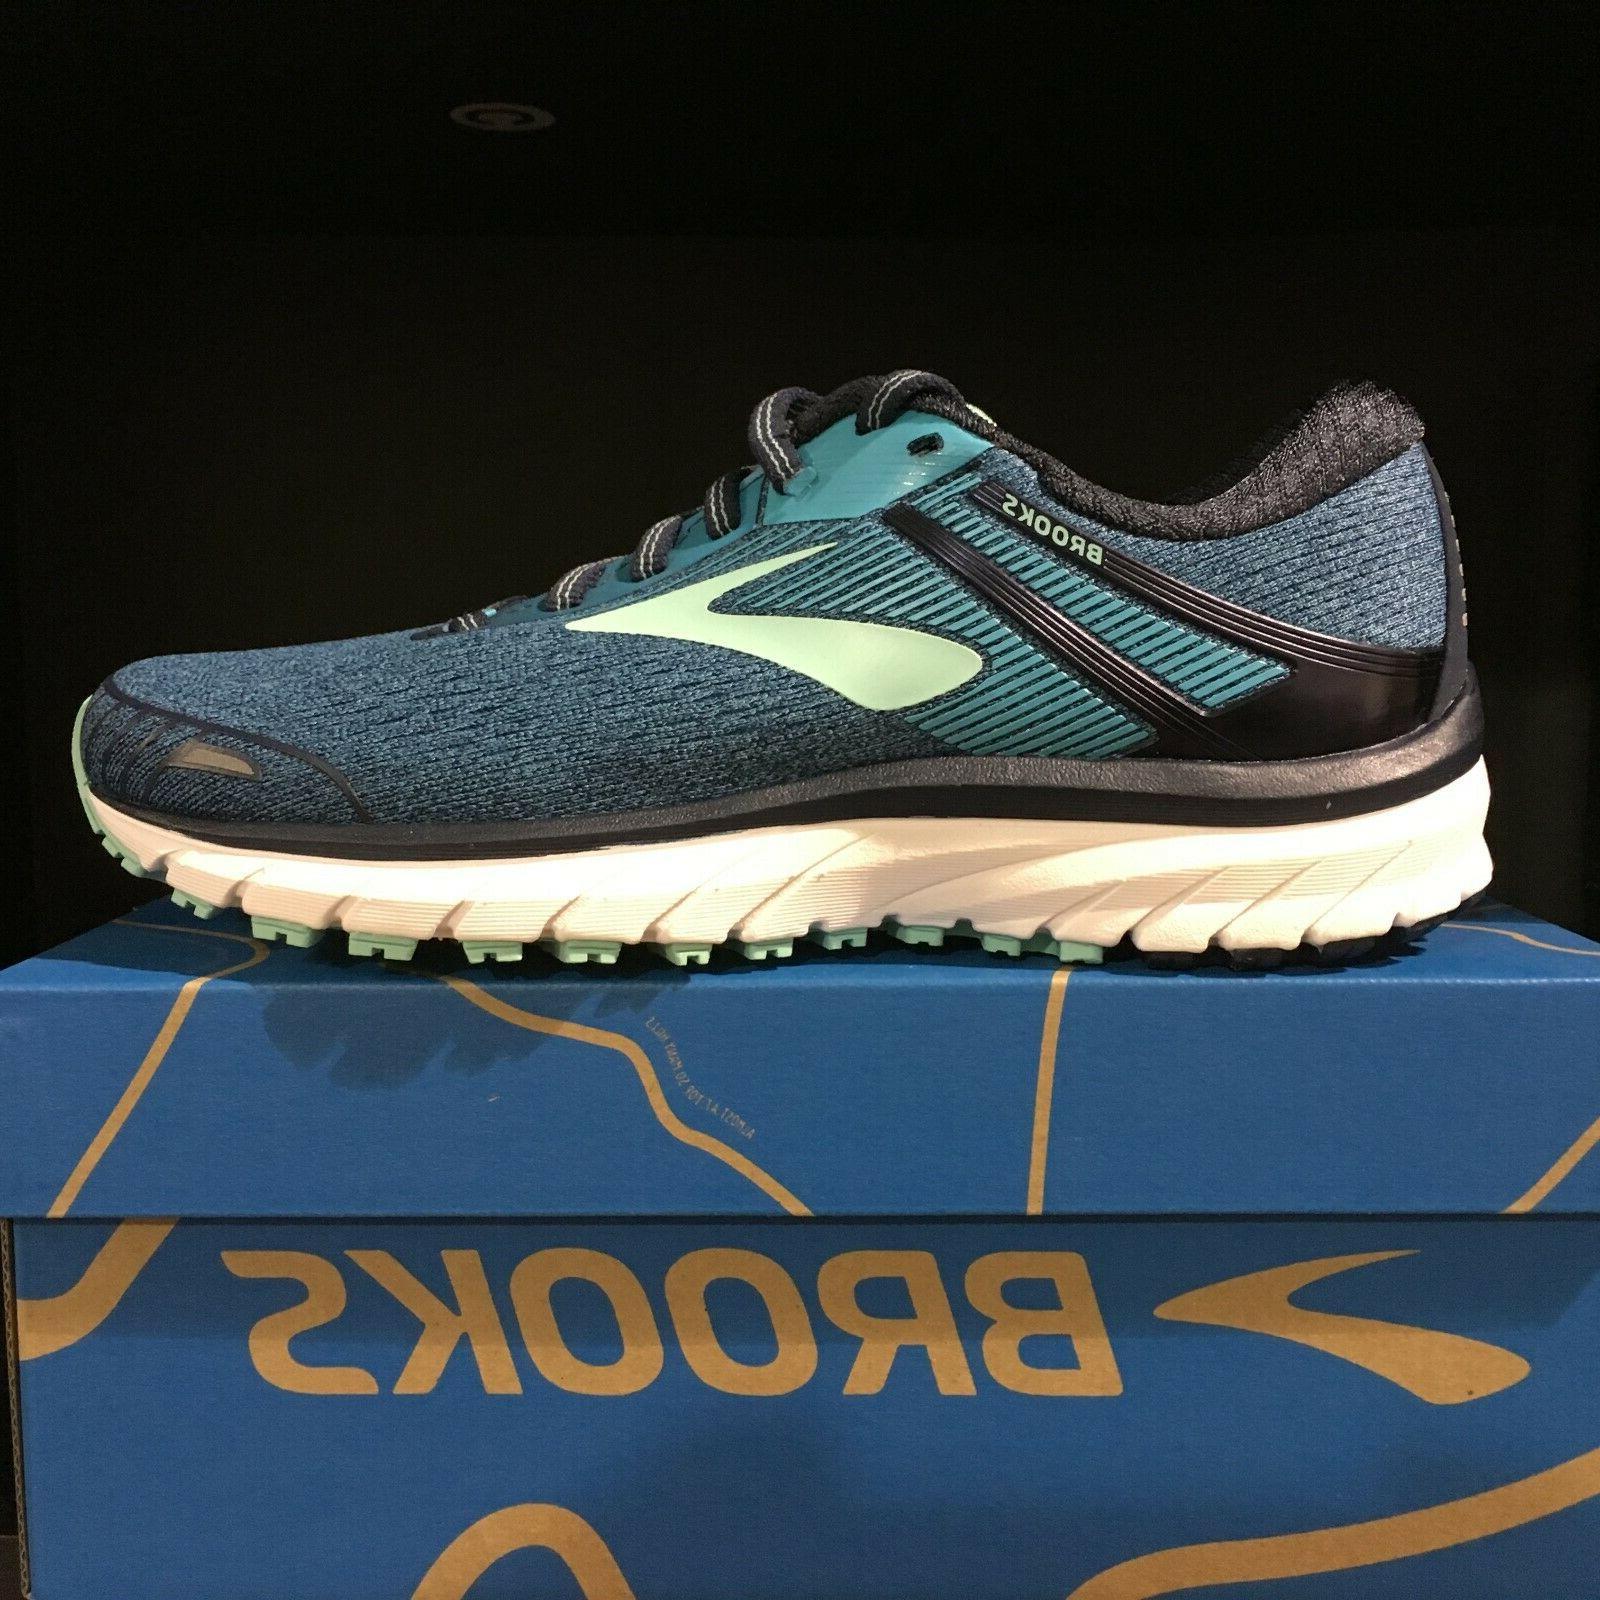 womens adrenaline gts 18 running shoes navy